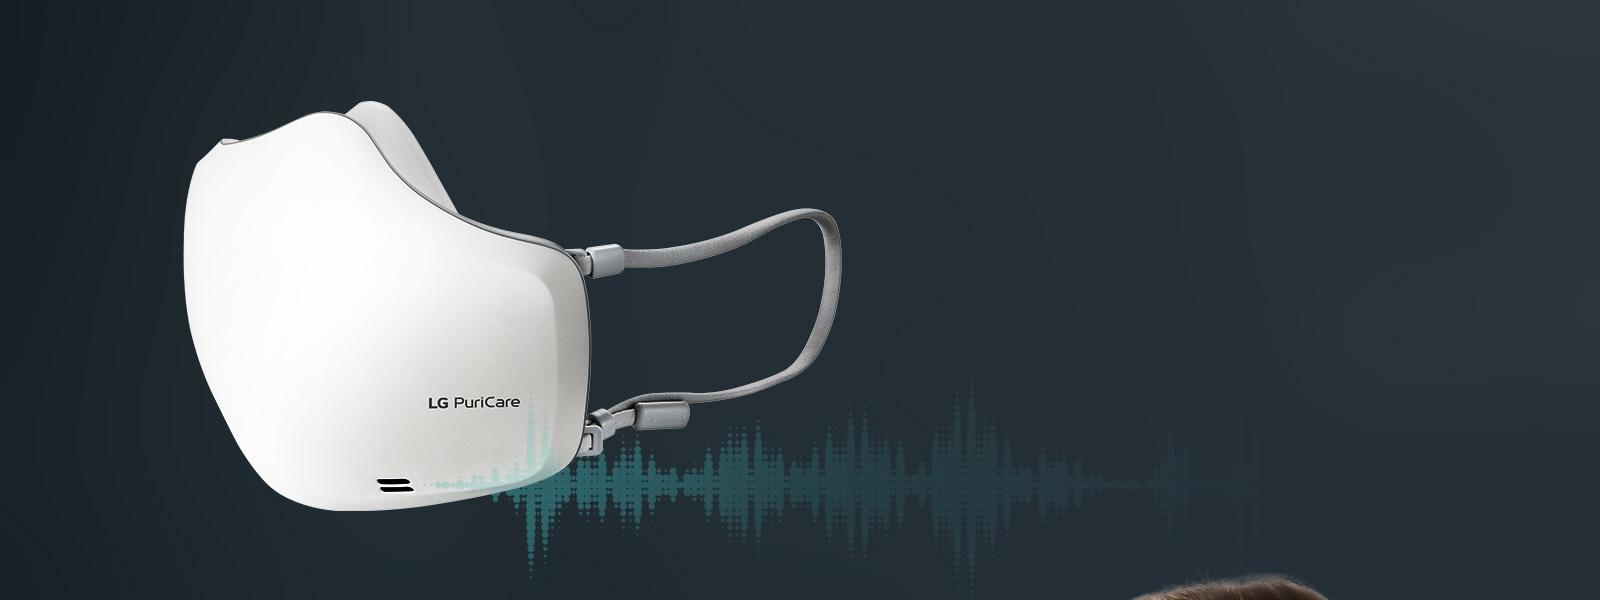 VoiceON™ 的智能設計讓你能清楚地聽到聲音。